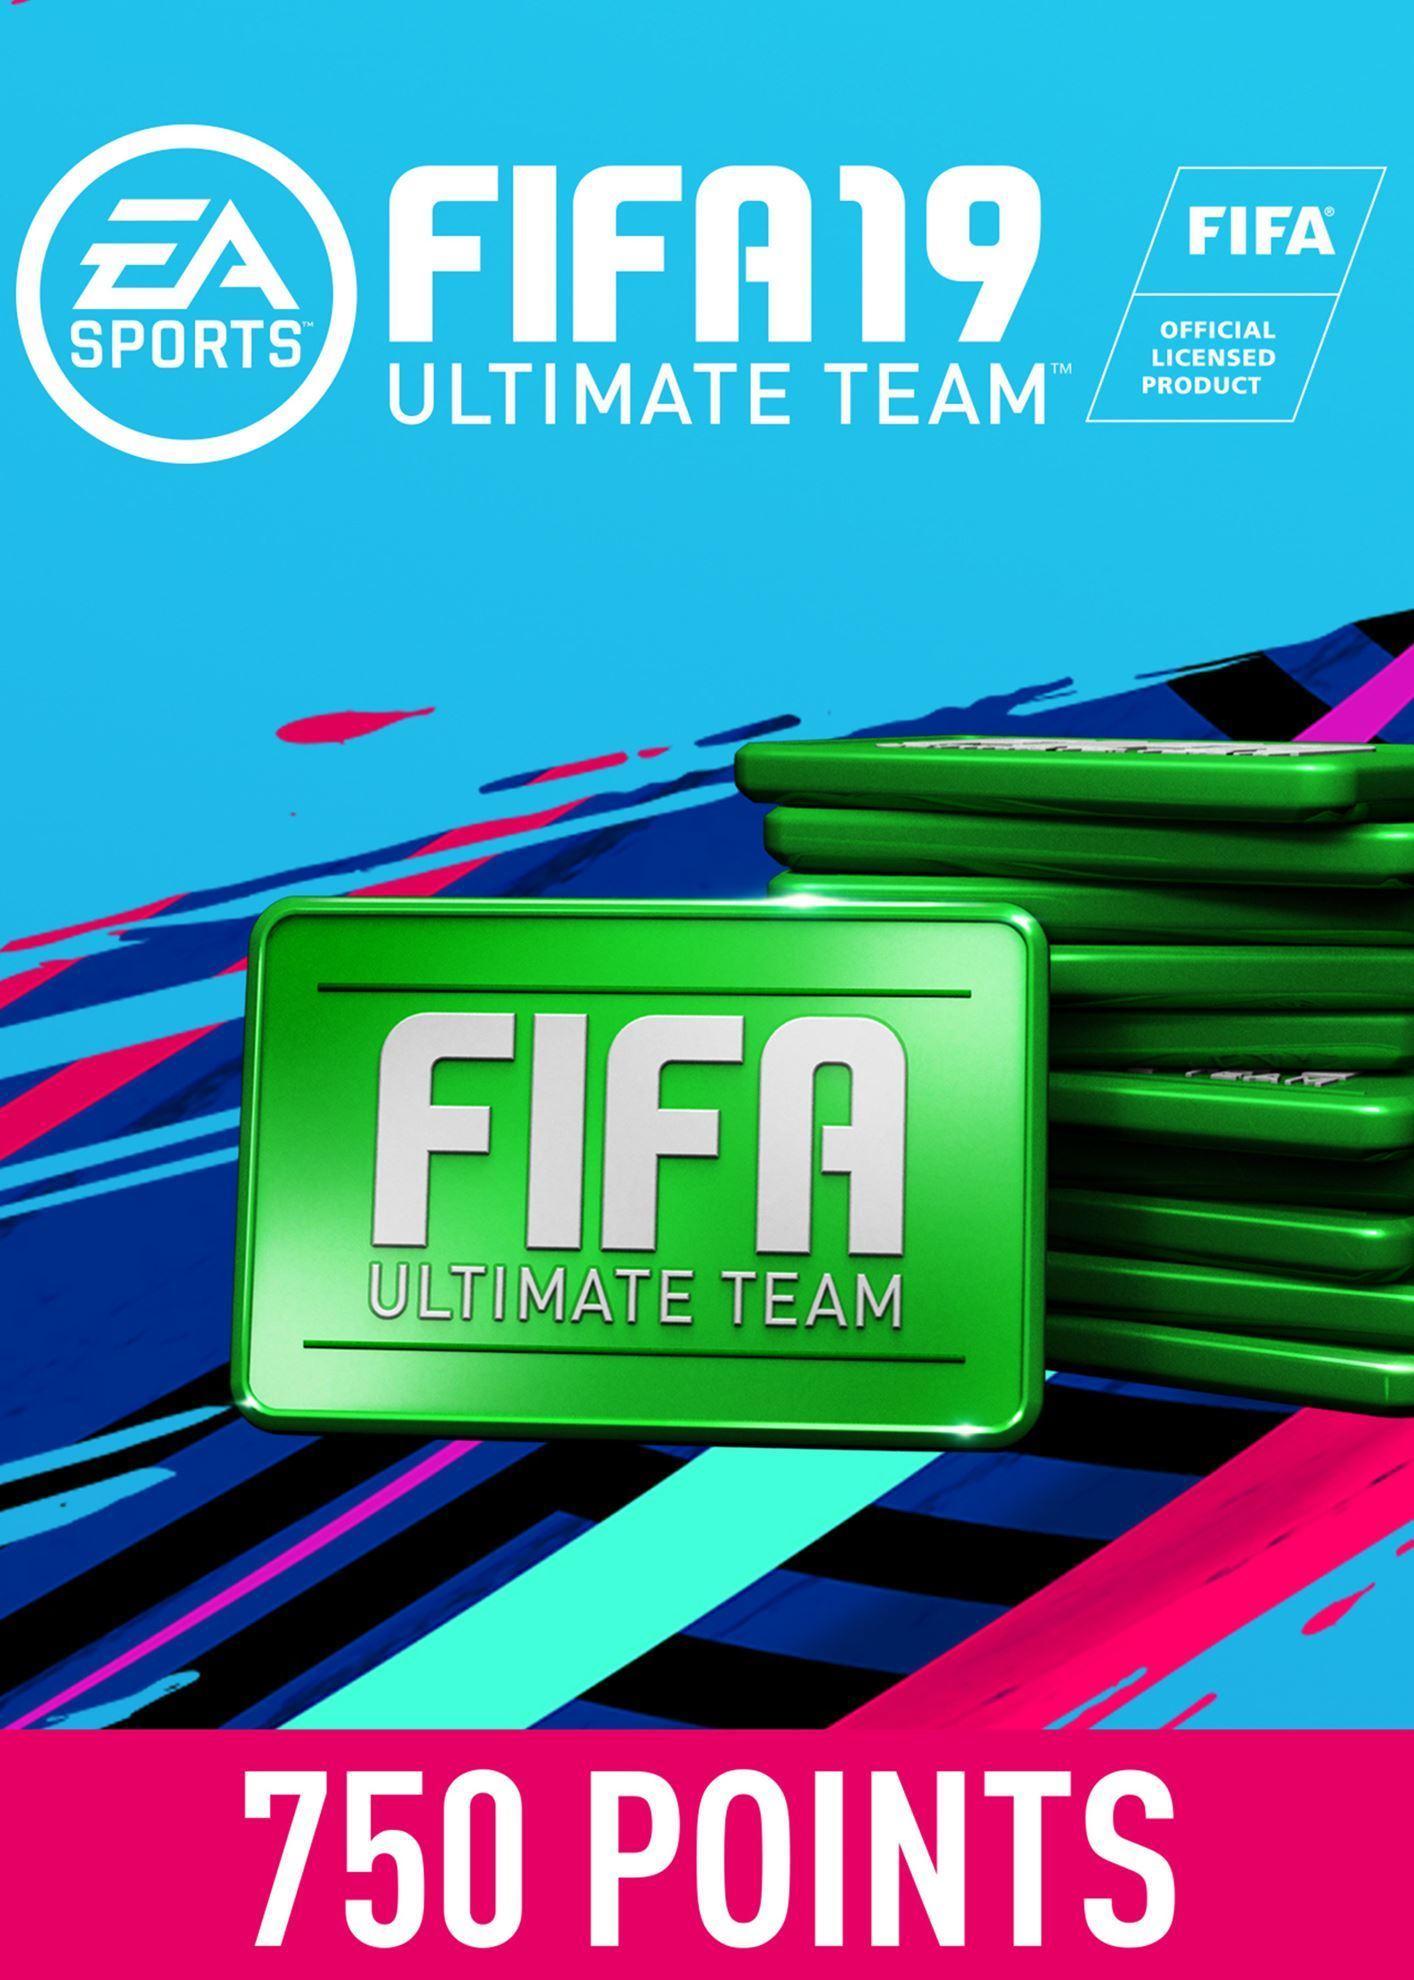 FIFA 19 ULTIMATE TEAM FIFA POINTS 750